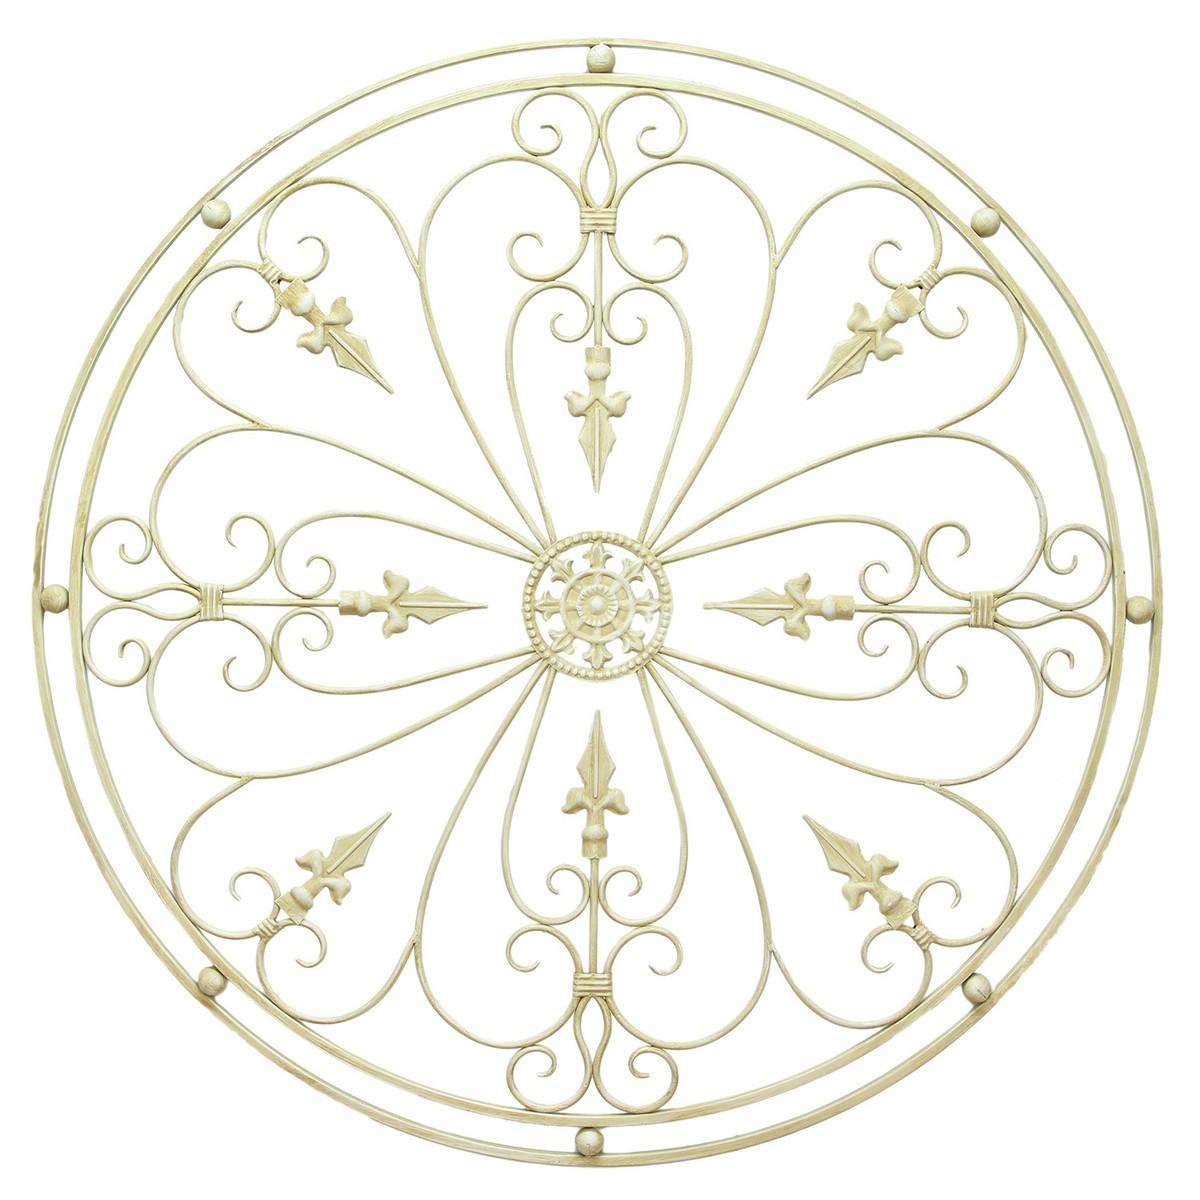 Stratton Home Decor Rustic Medallion Wall Art White ~ Stratton home decor antique medallion wall white